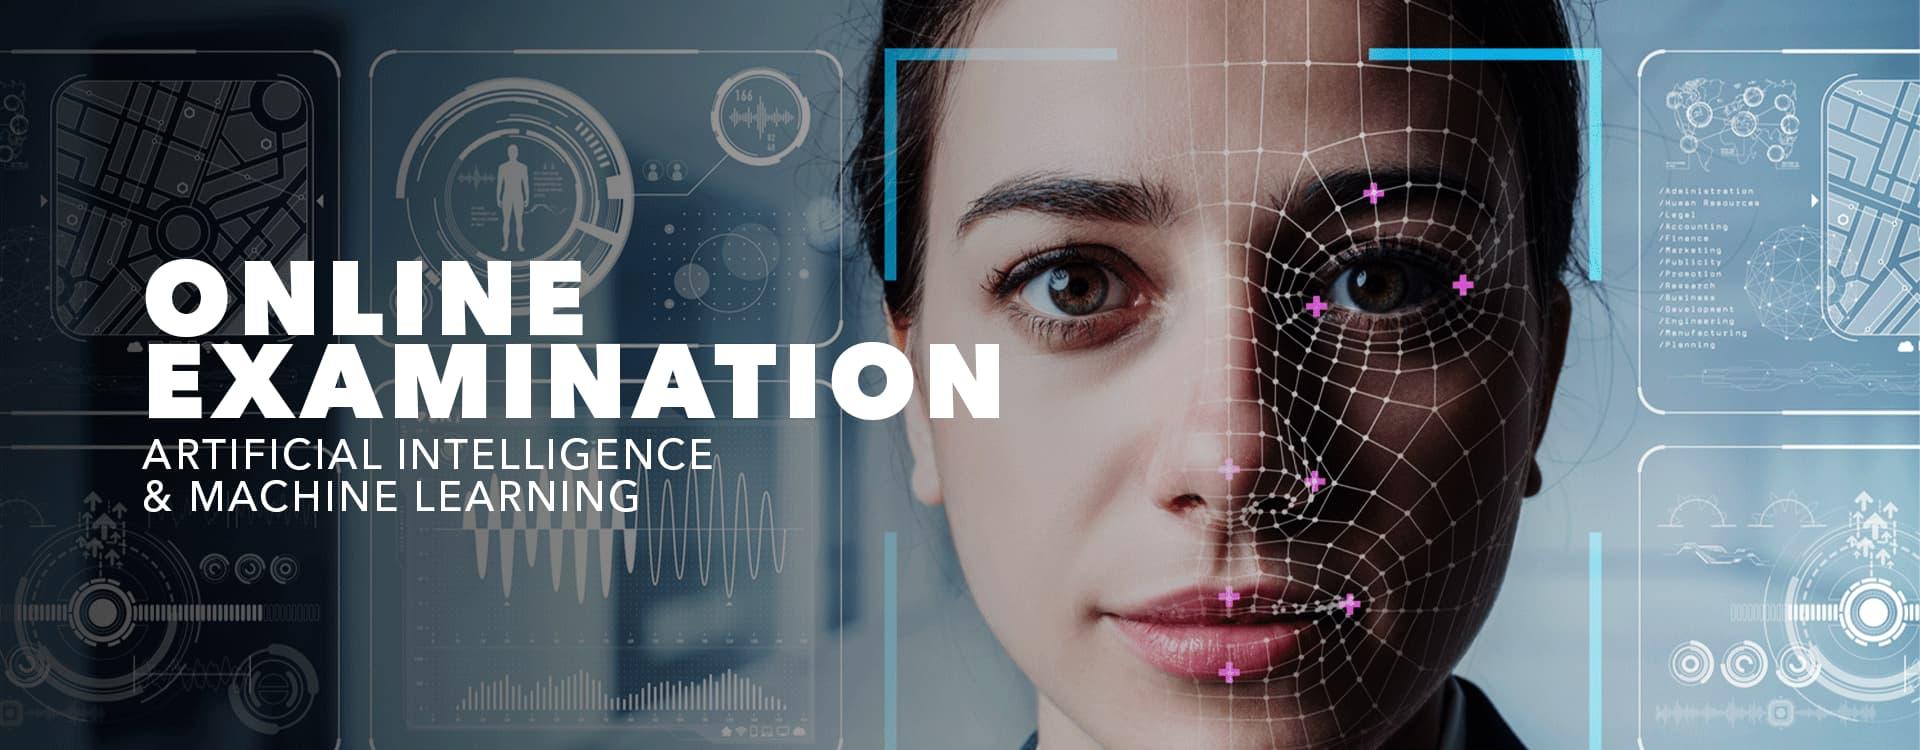 AI development company, AI online examination developed by StudioKrew